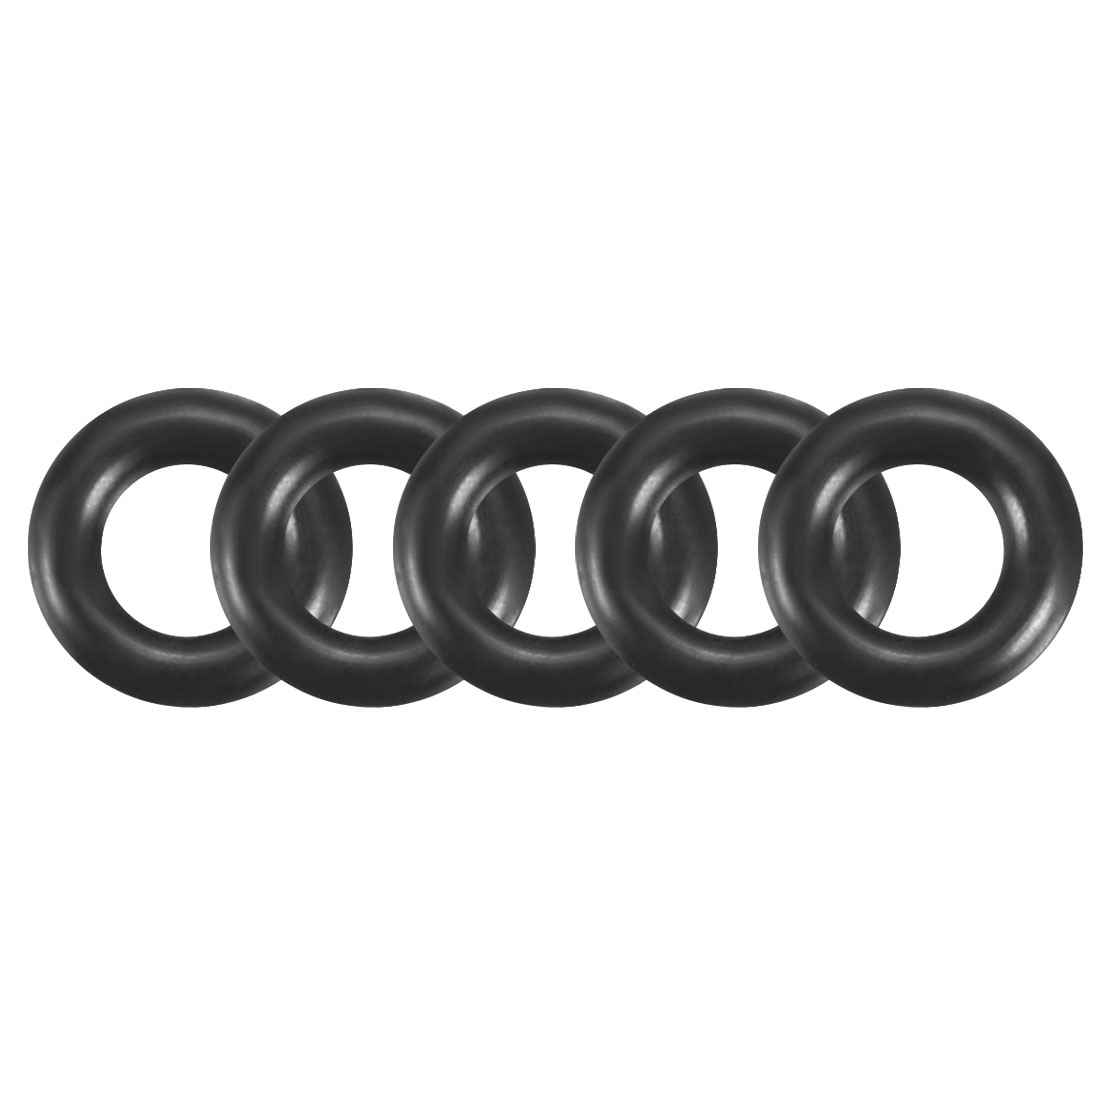 100Pcs Black 5mm x 1.2mm Nitrile Rubber O Ring NBR Oil Sealing Grommets